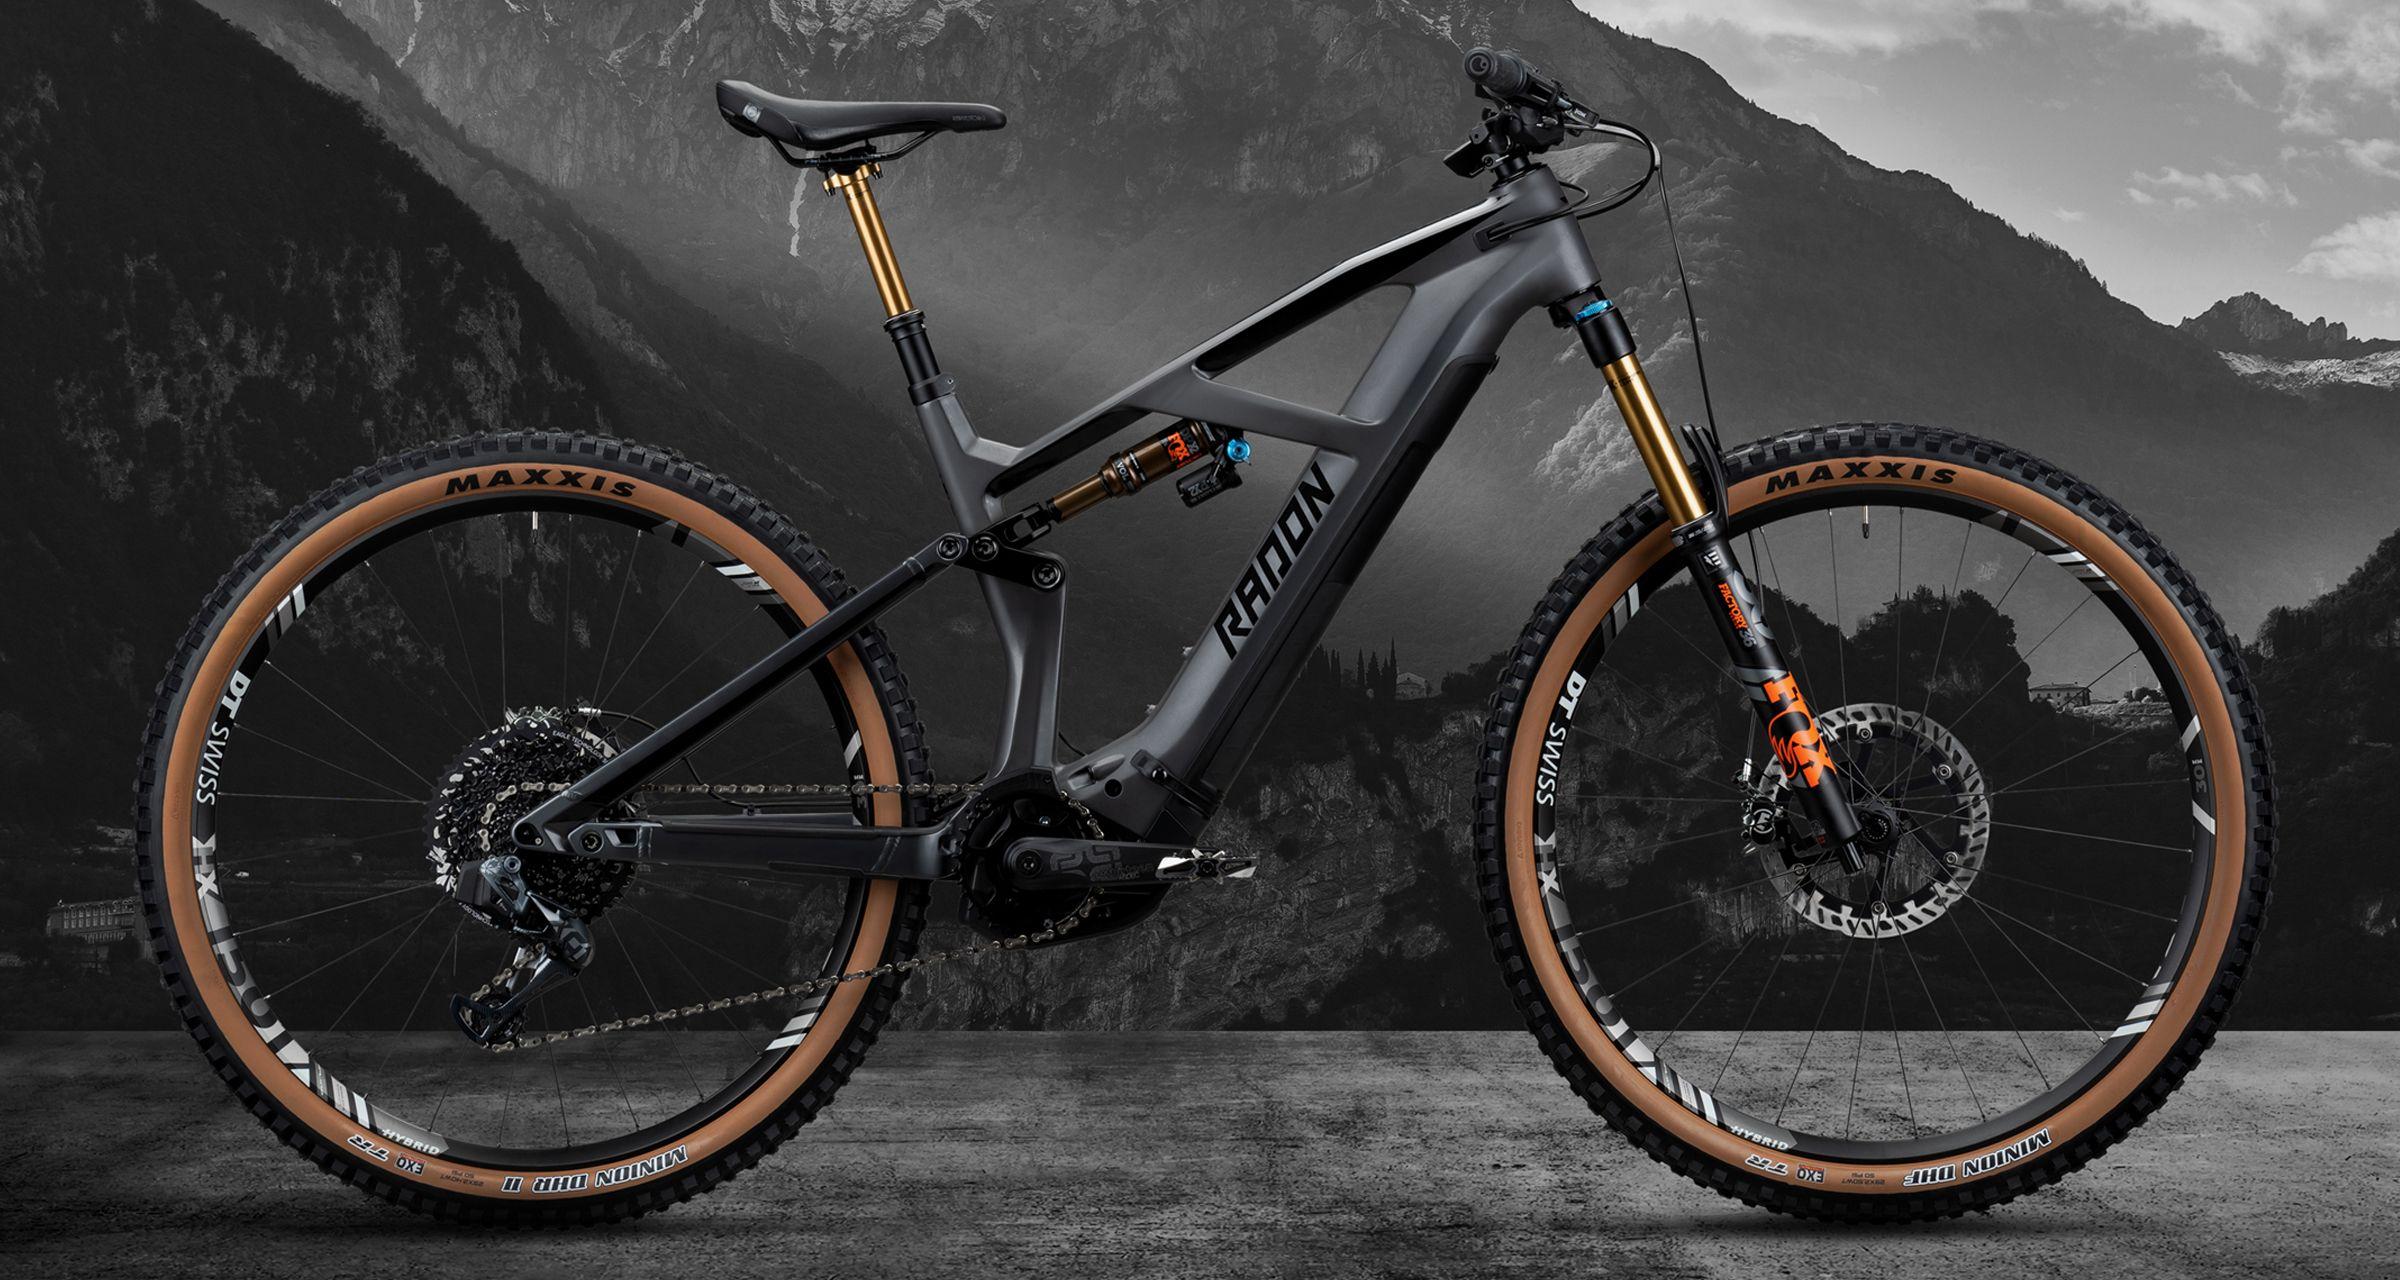 Radon Neuheiten 2020 Render Starkes E Trailbike Mit Stylischem Carbon Rahmen Emtb News De E Bike Neuheiten E Mountain Bike Enduro Fahrrad